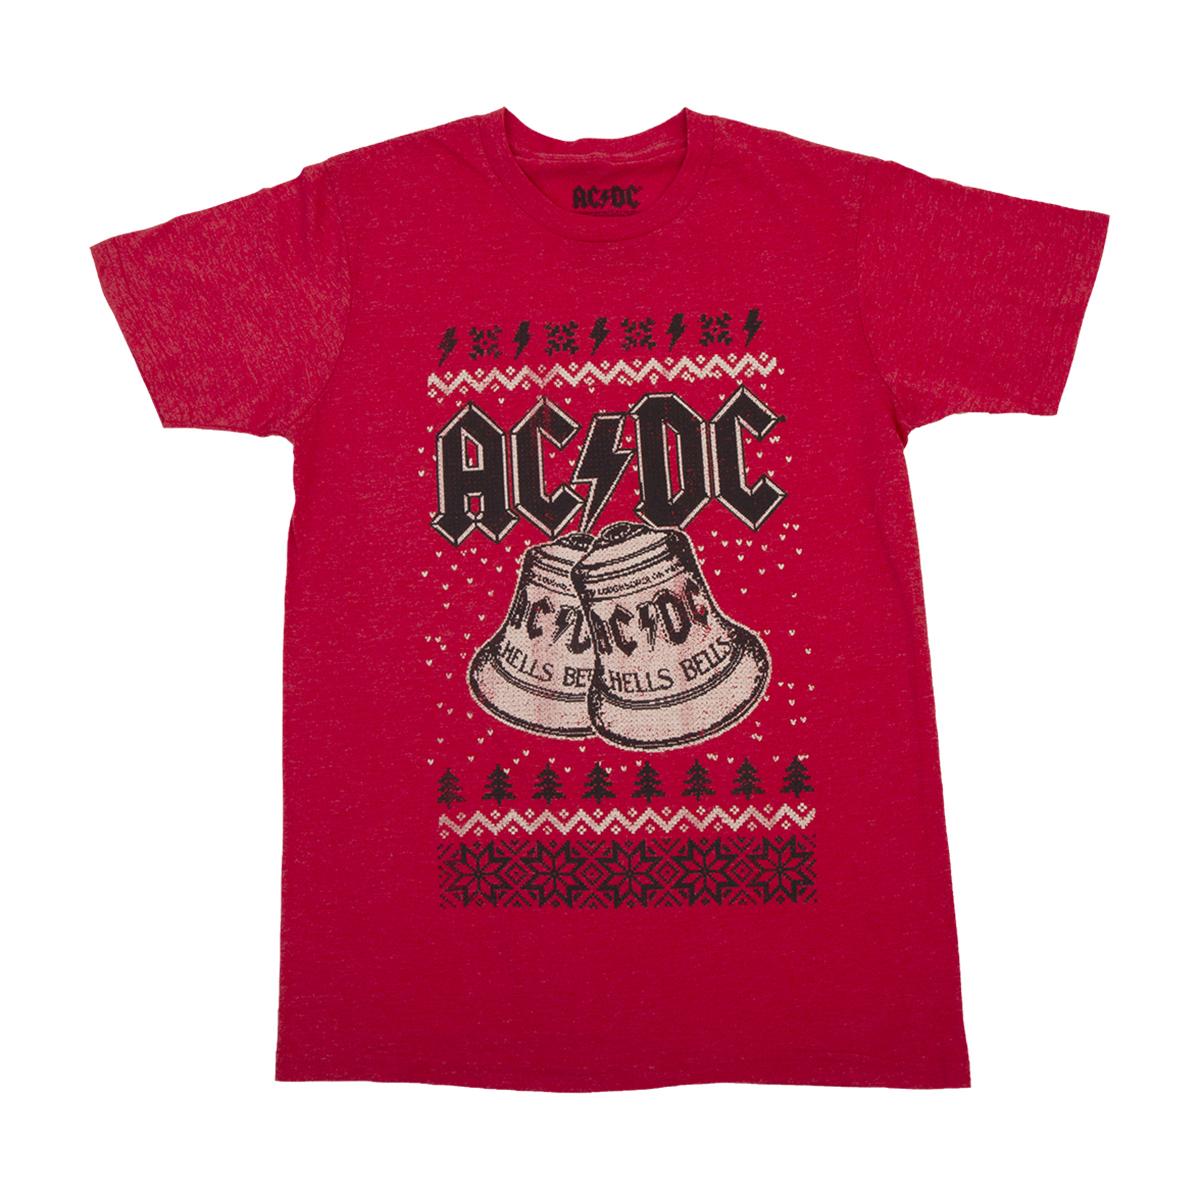 AC/DC Hells Bells Festive T-shirt